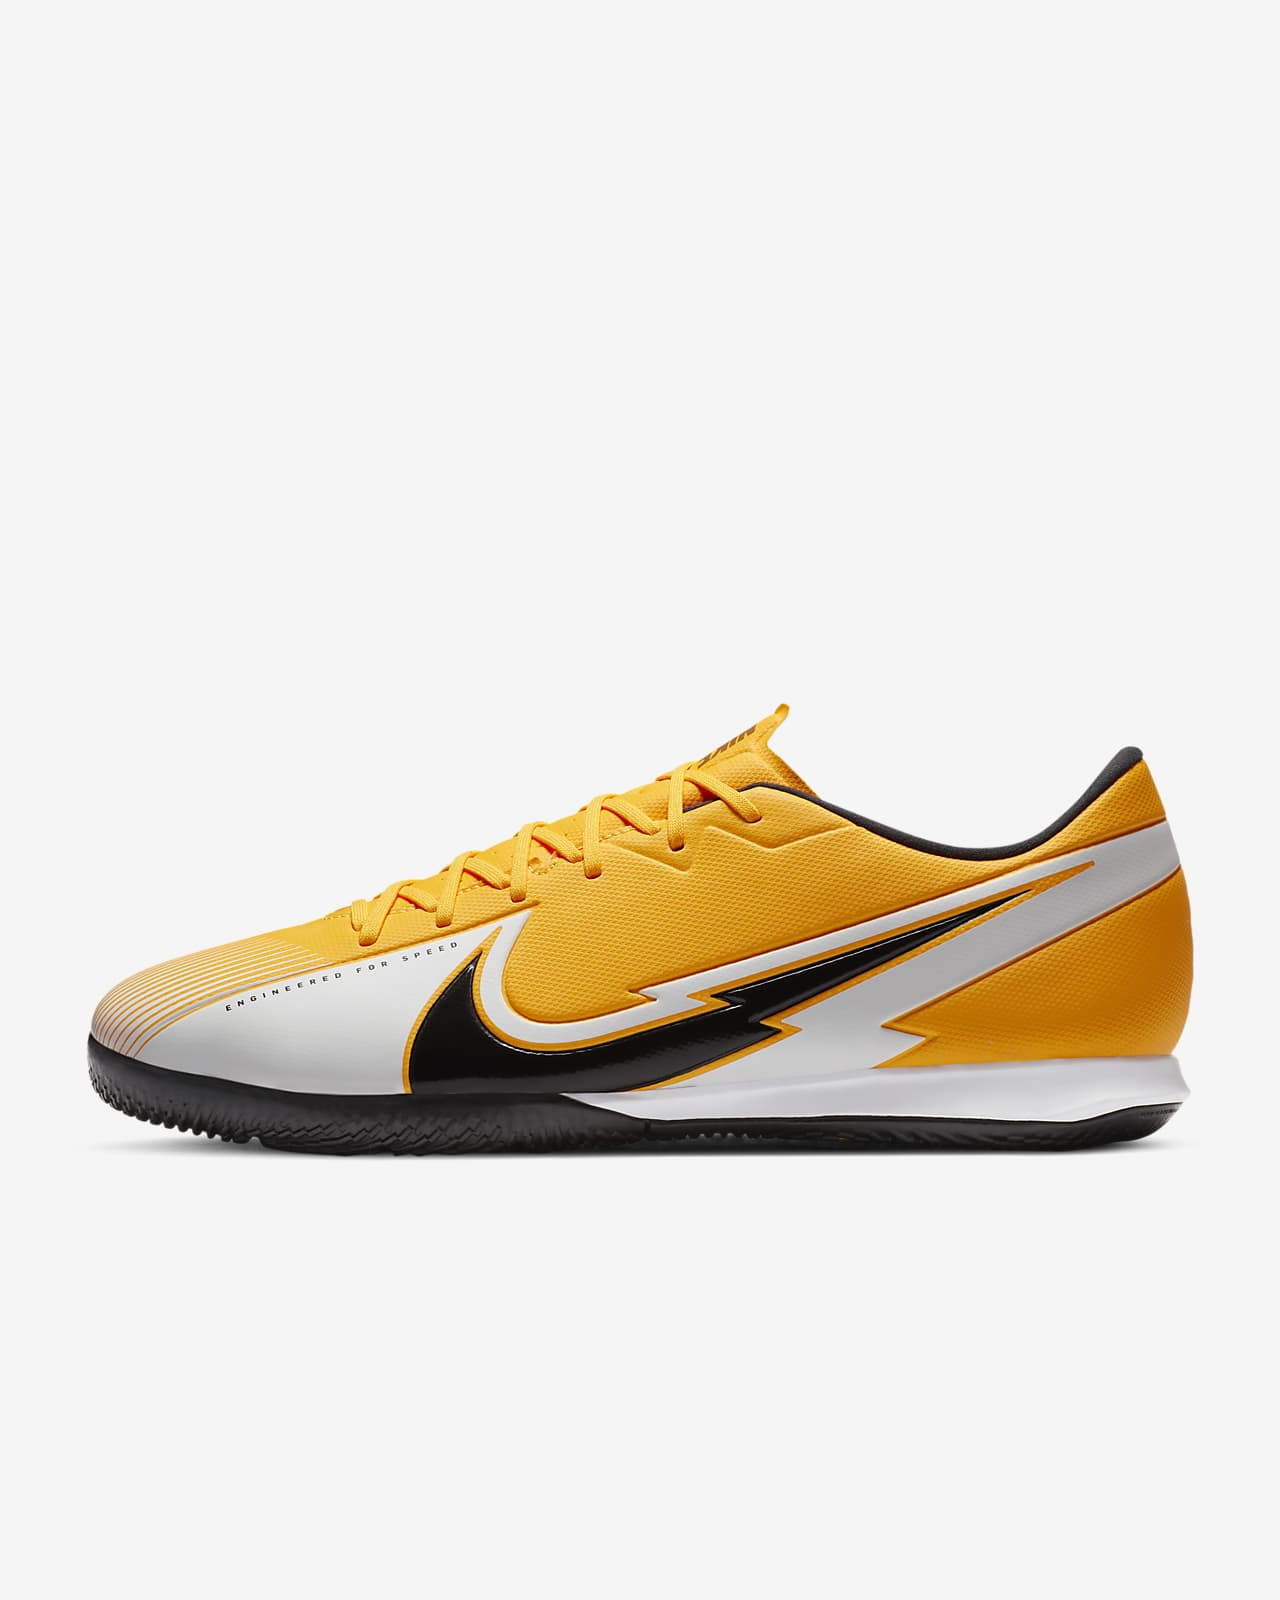 Halowe Buty Pilkarskie Nike Mercurial Vapor 13 Academy Ic Nike Pl